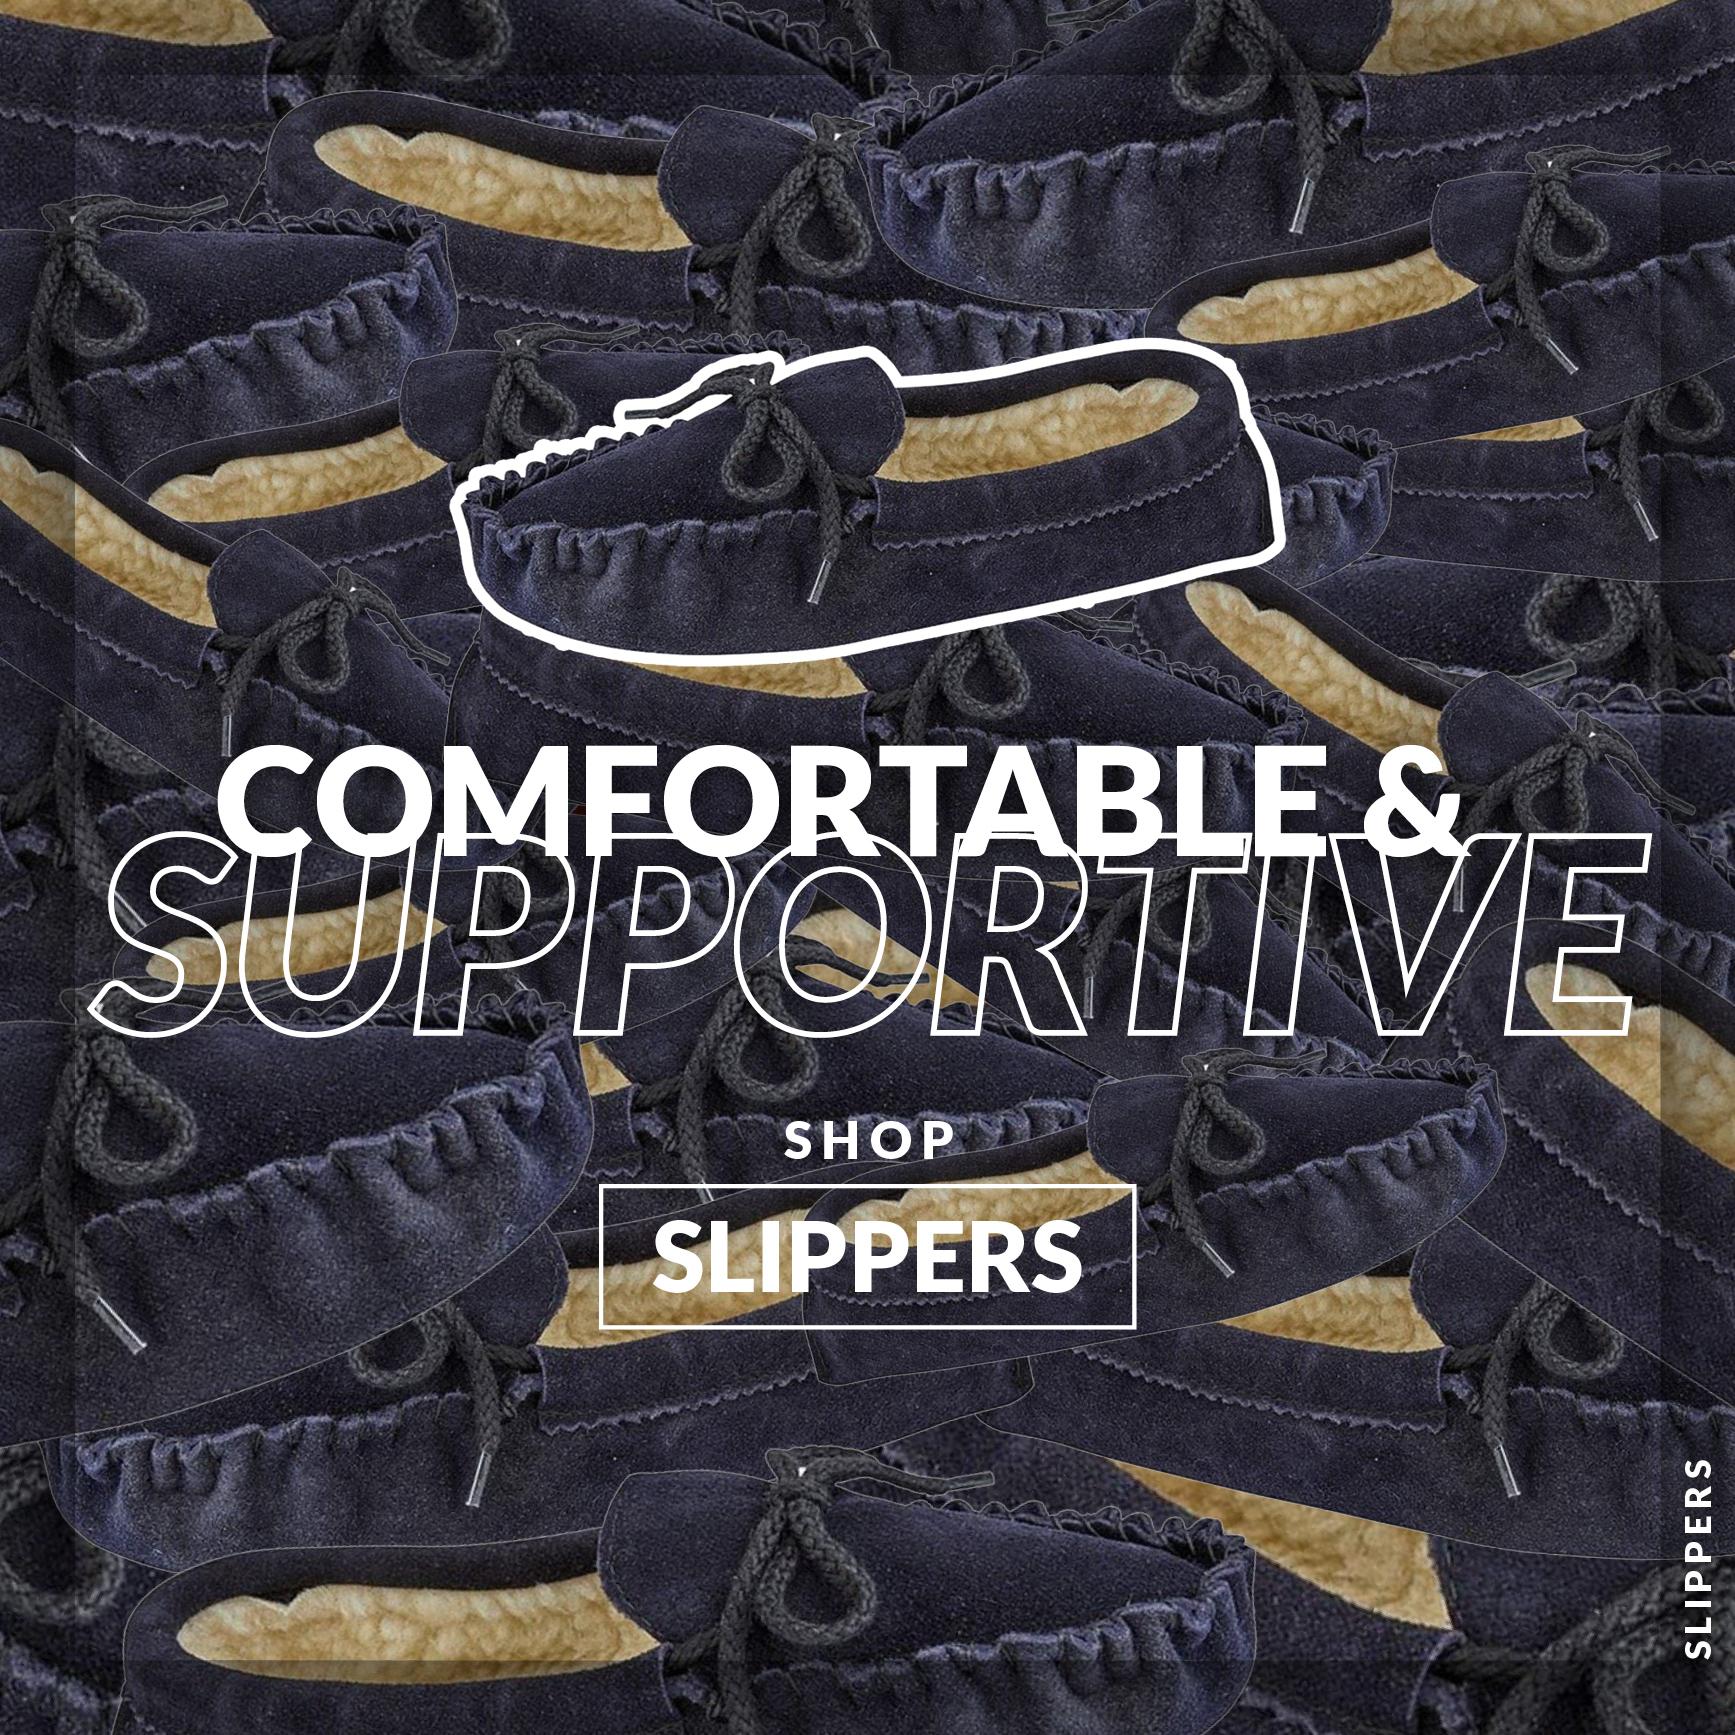 Shop Footwear at BC4U